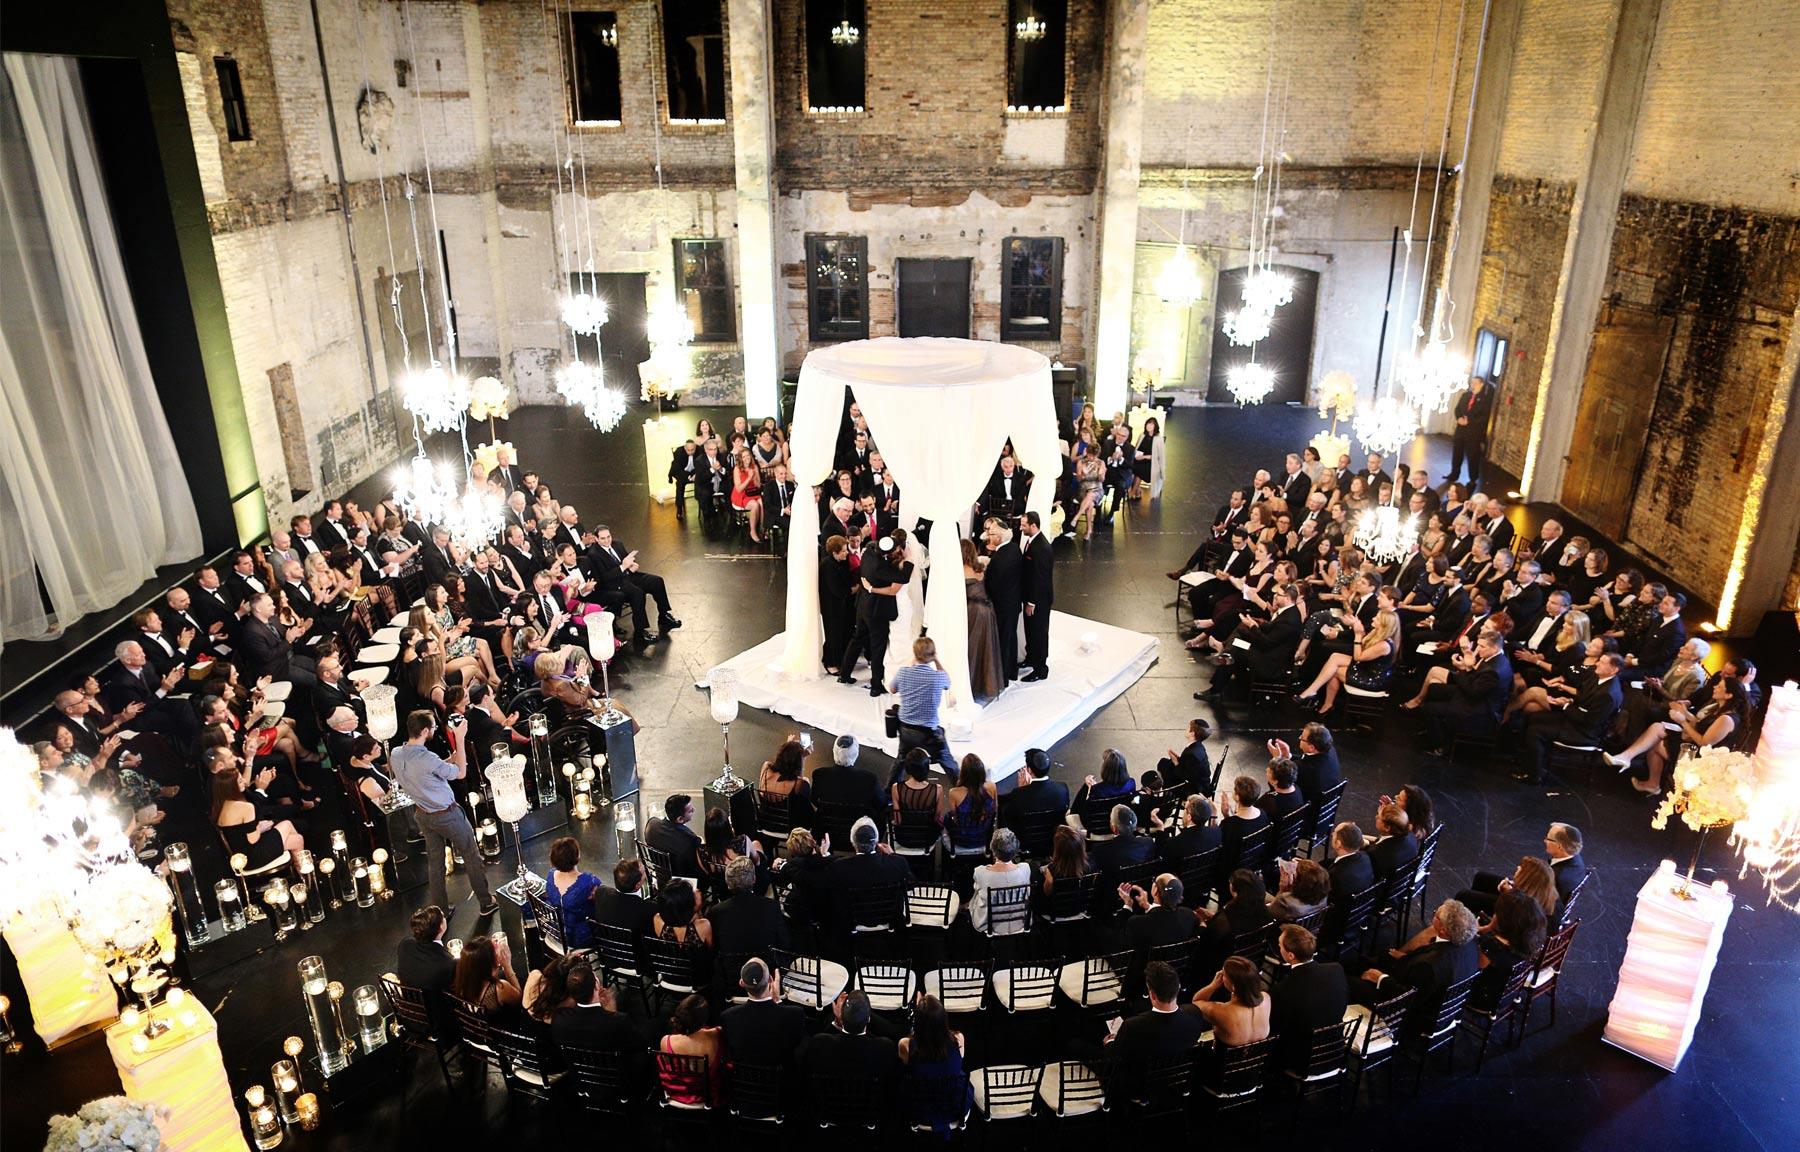 11-Minneapolis-Minnesota-Wedding-Photography-by-Vick-Photography-Aria-Downtown-Ceremony-Layne-&-Dan.jpg